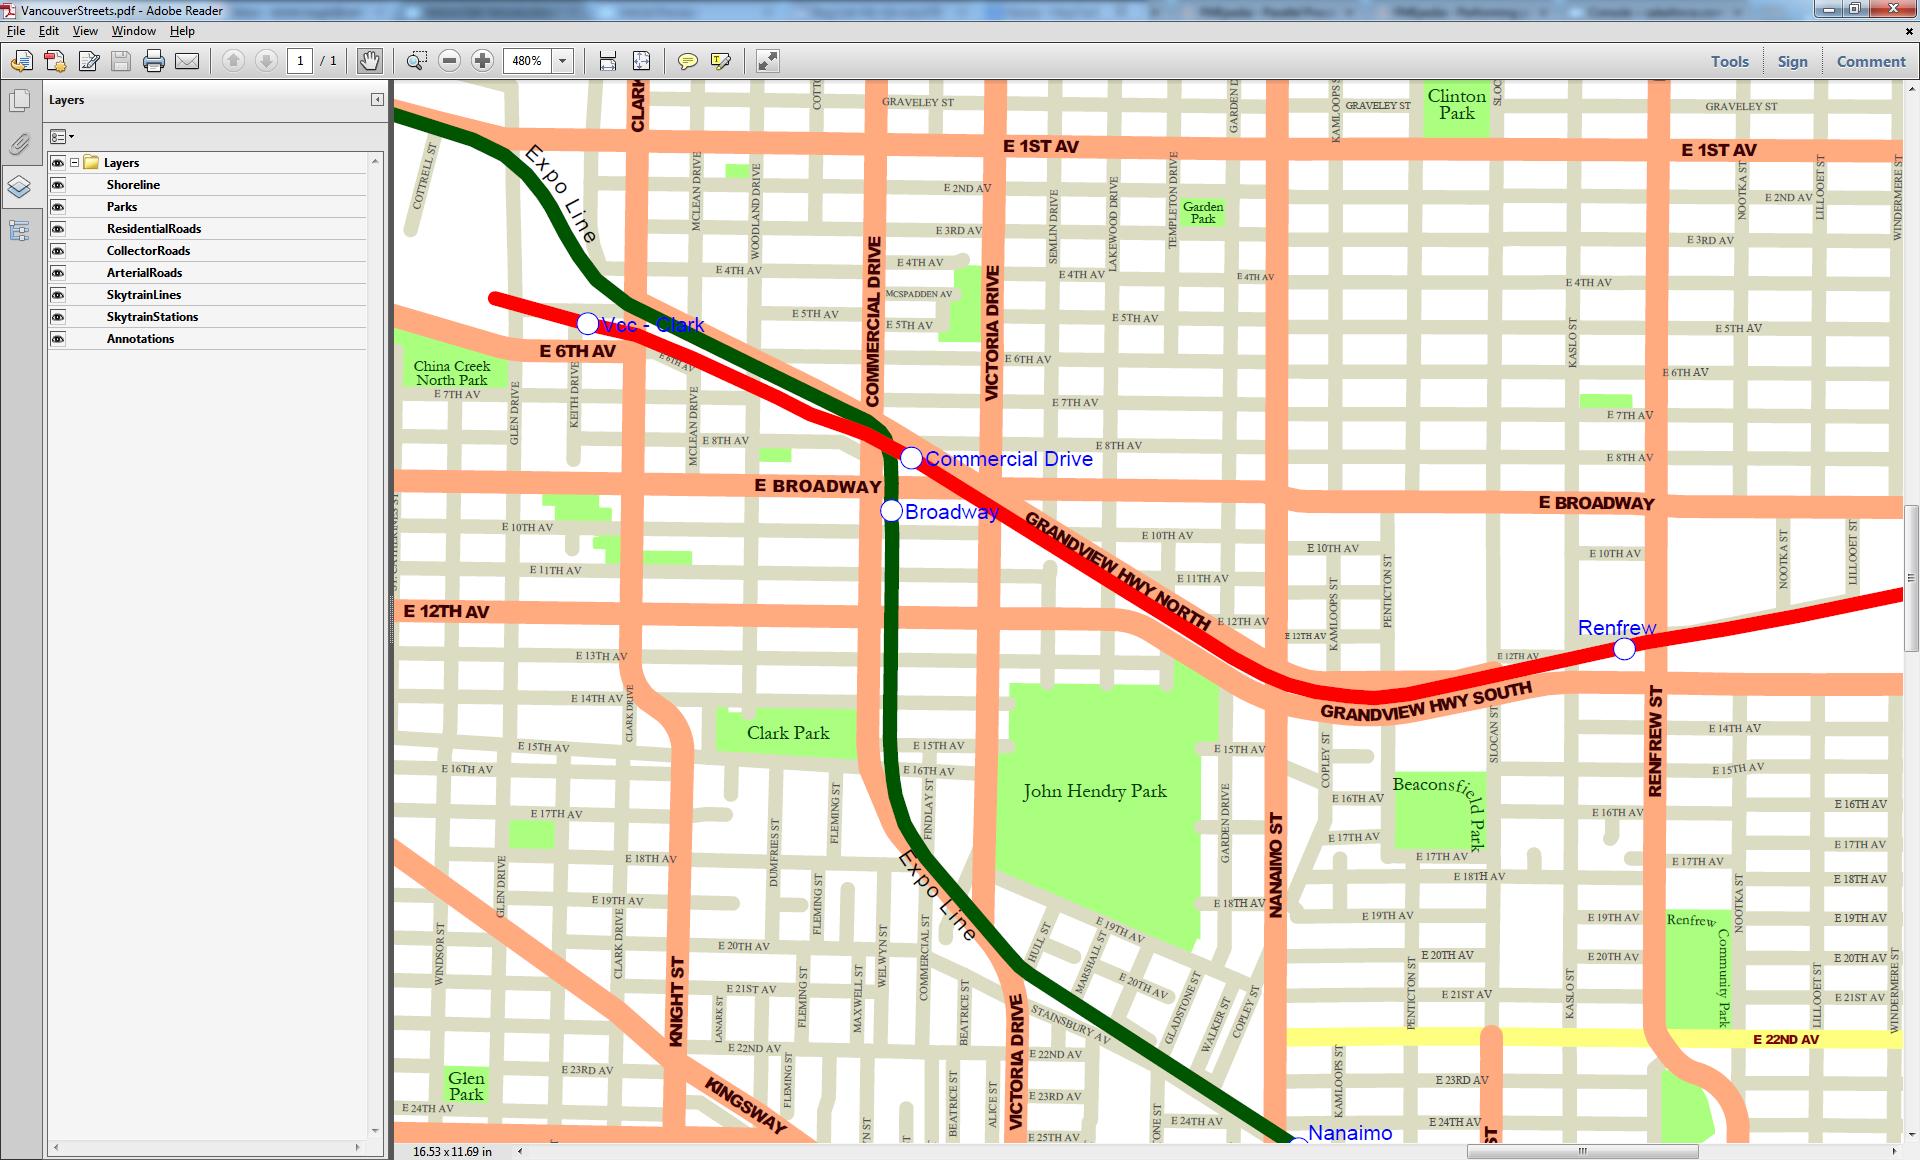 Vancouver Streets output PDF